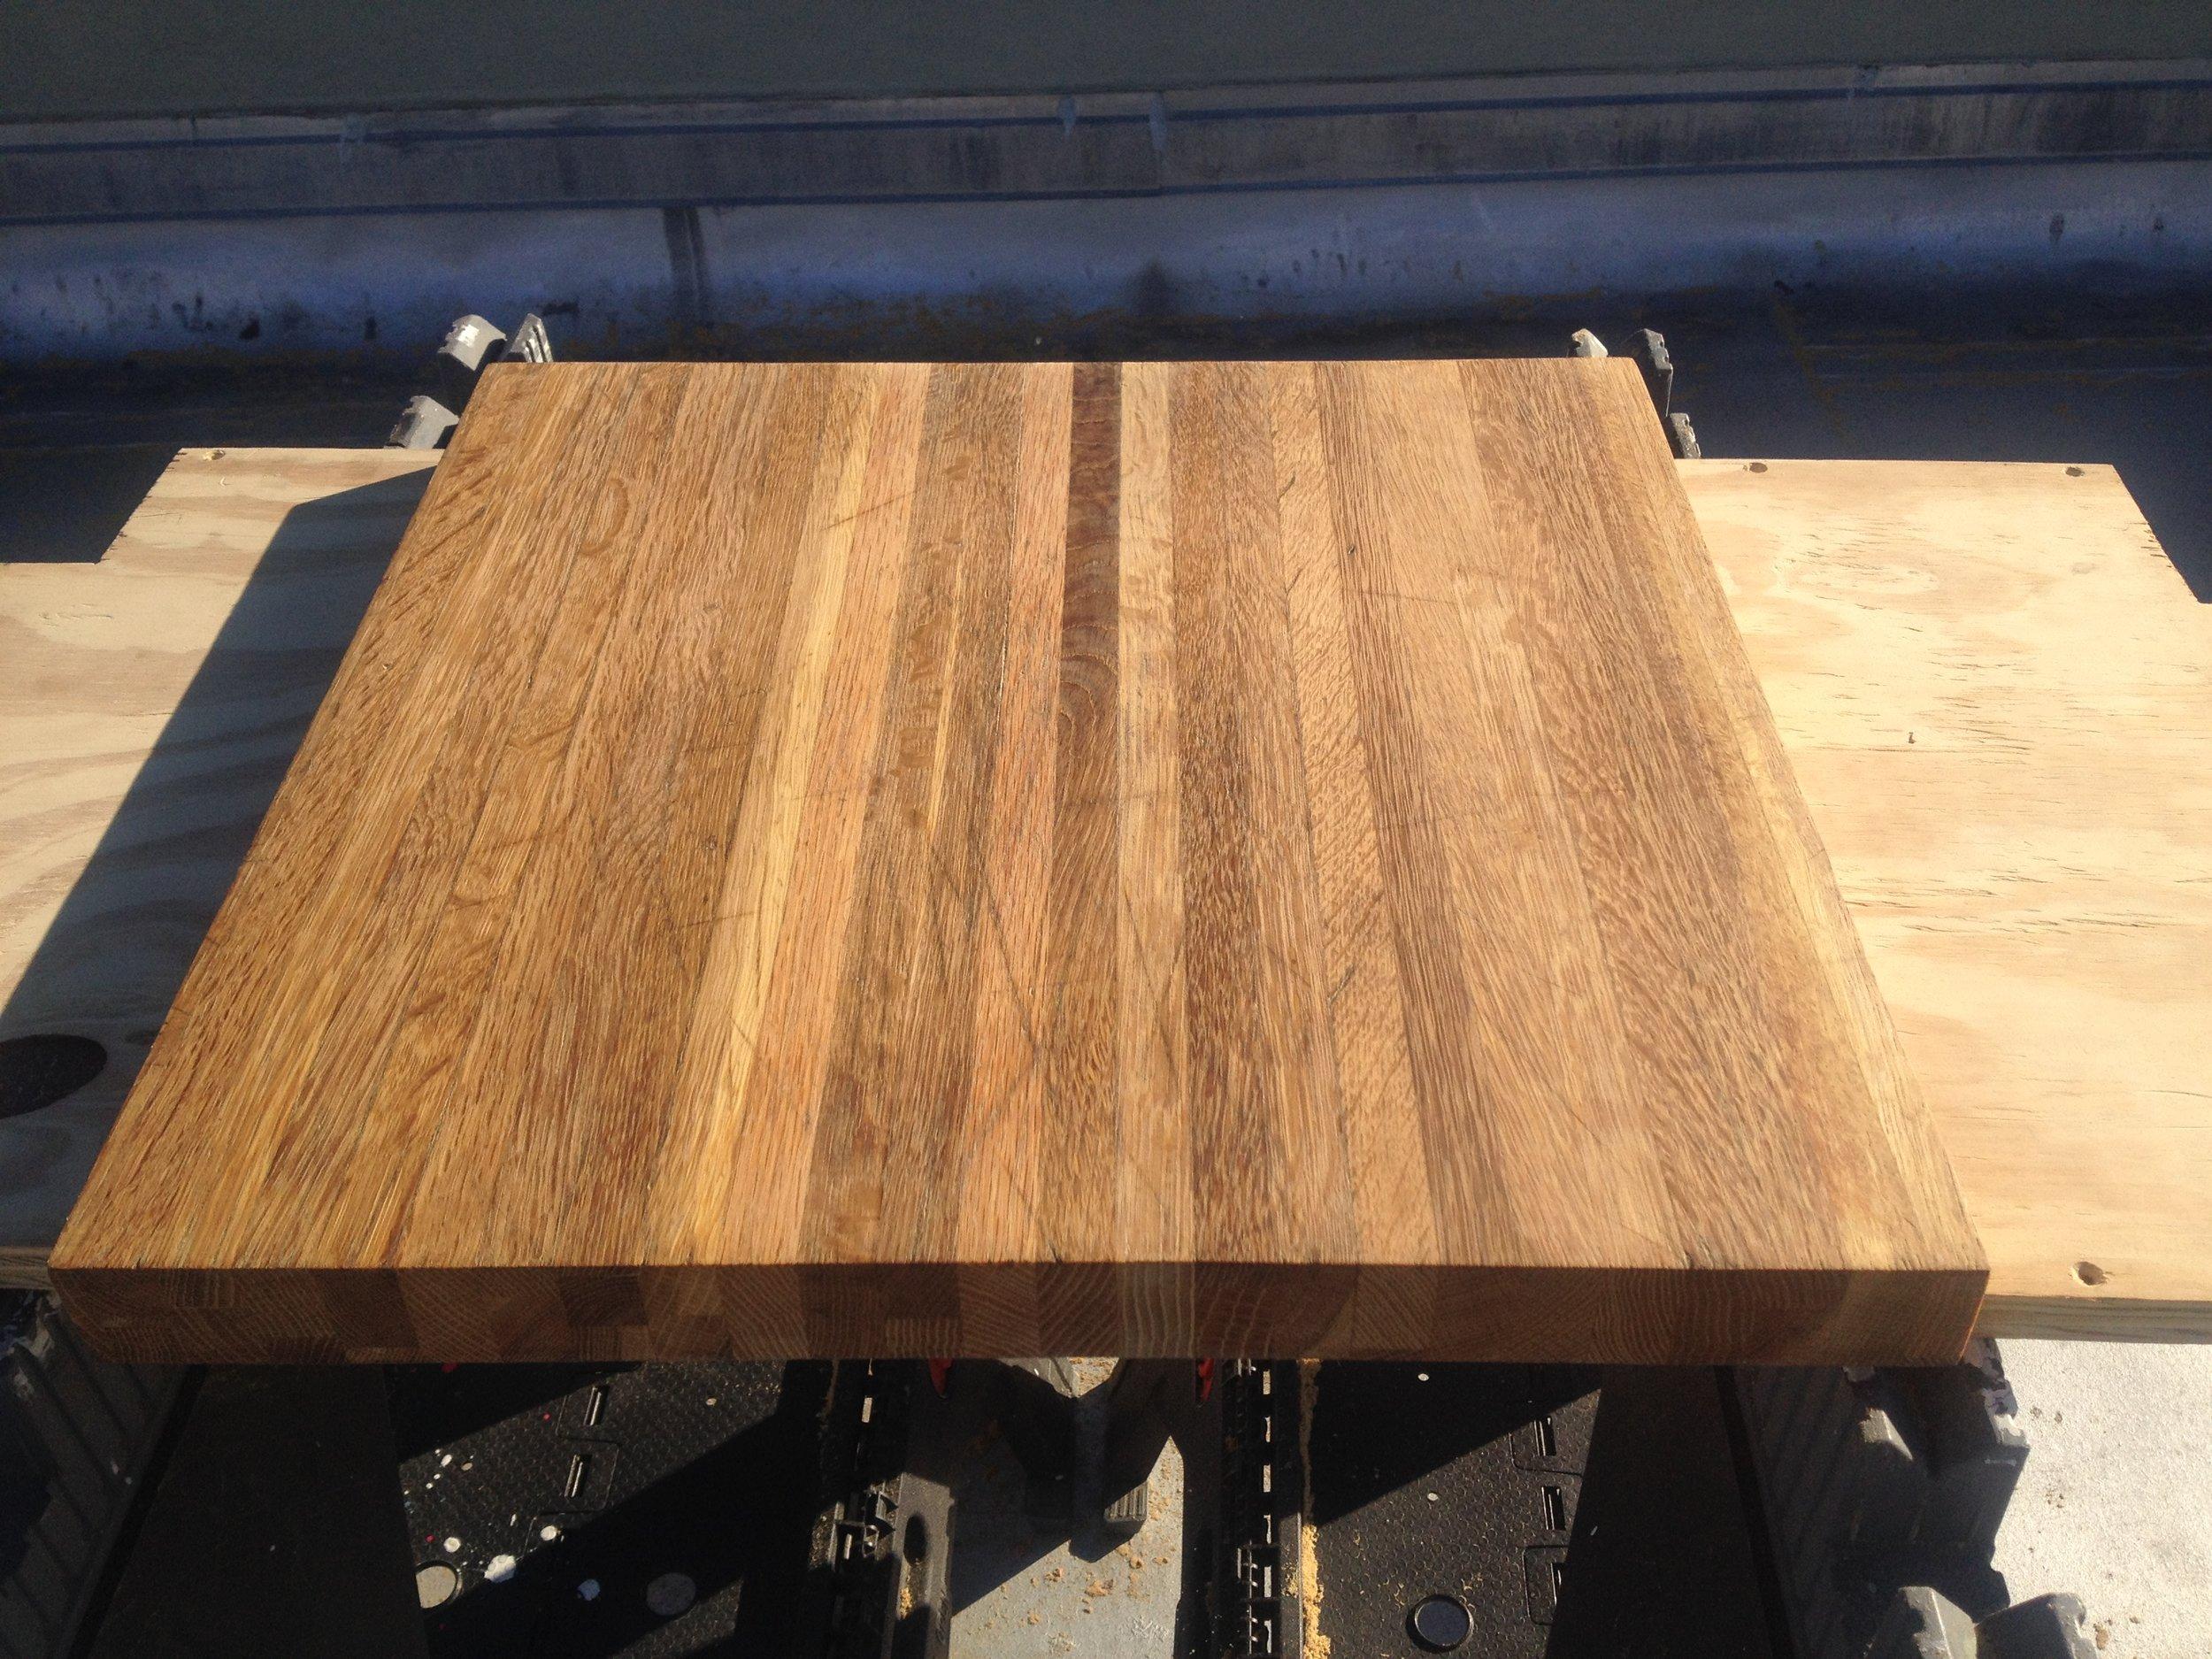 cutting-board-restoration-in-progress-9.jpg